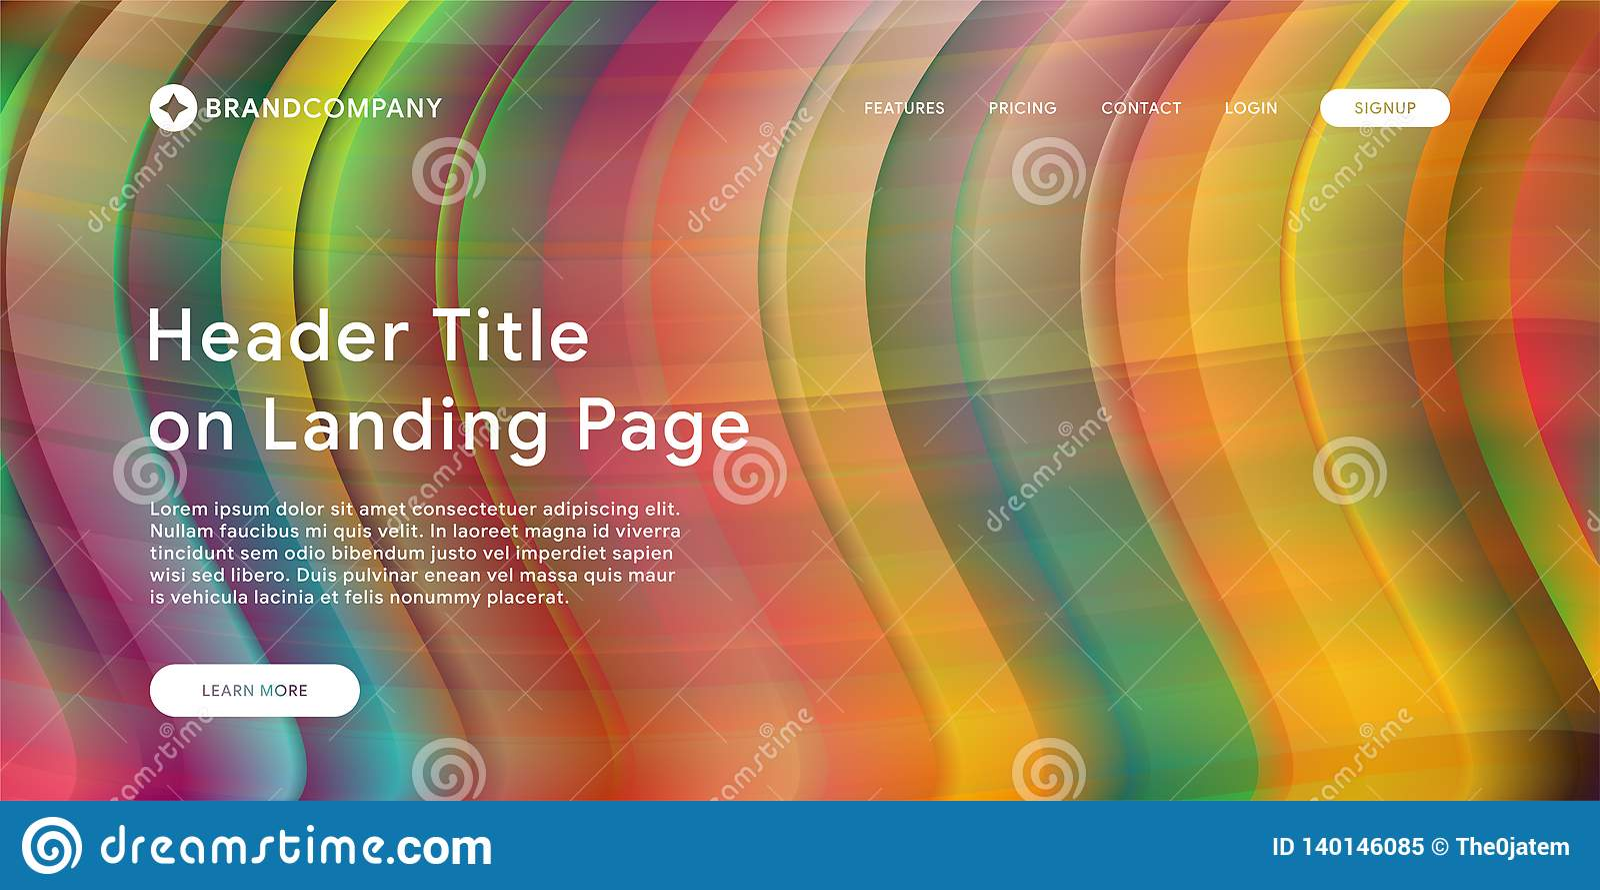 Vector illustration of Creative design with fluid colorful shapes. Trendy color gradients. Strip design. Fluid shapes composition